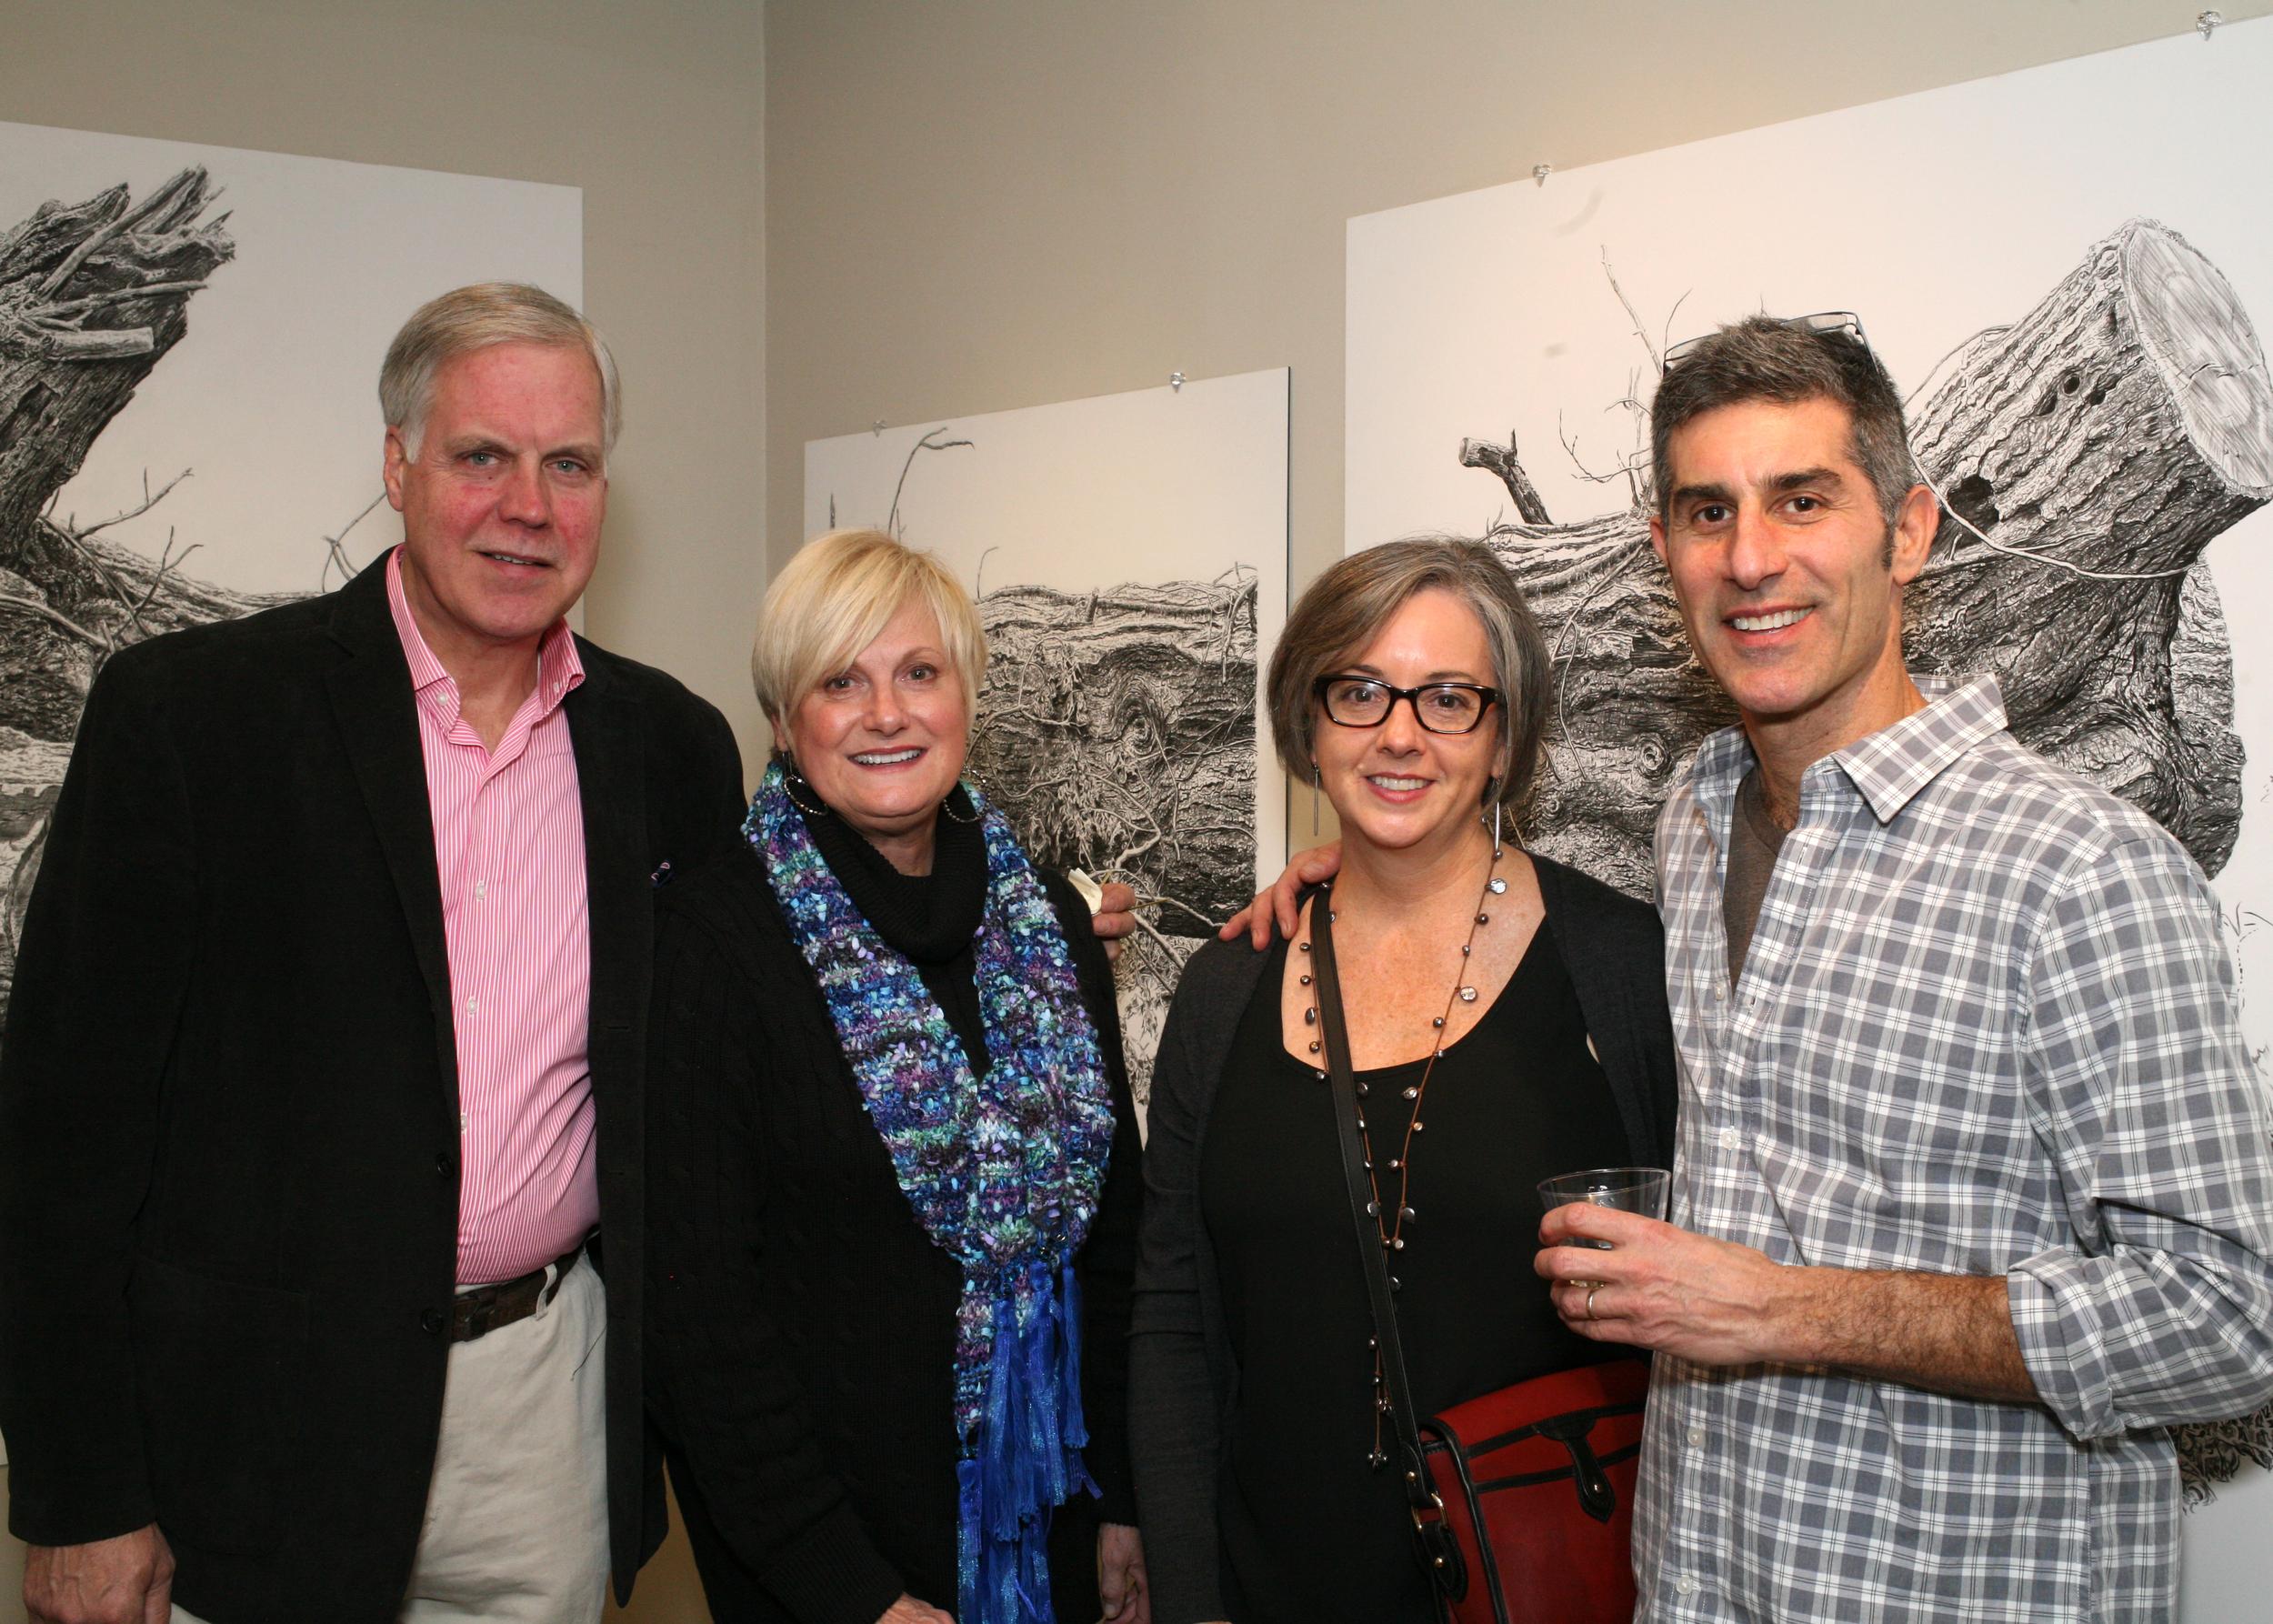 IMG_2461 Jonathan and Carrie Schmitz, Jeannine Madoff, Alec Madoff.JPG